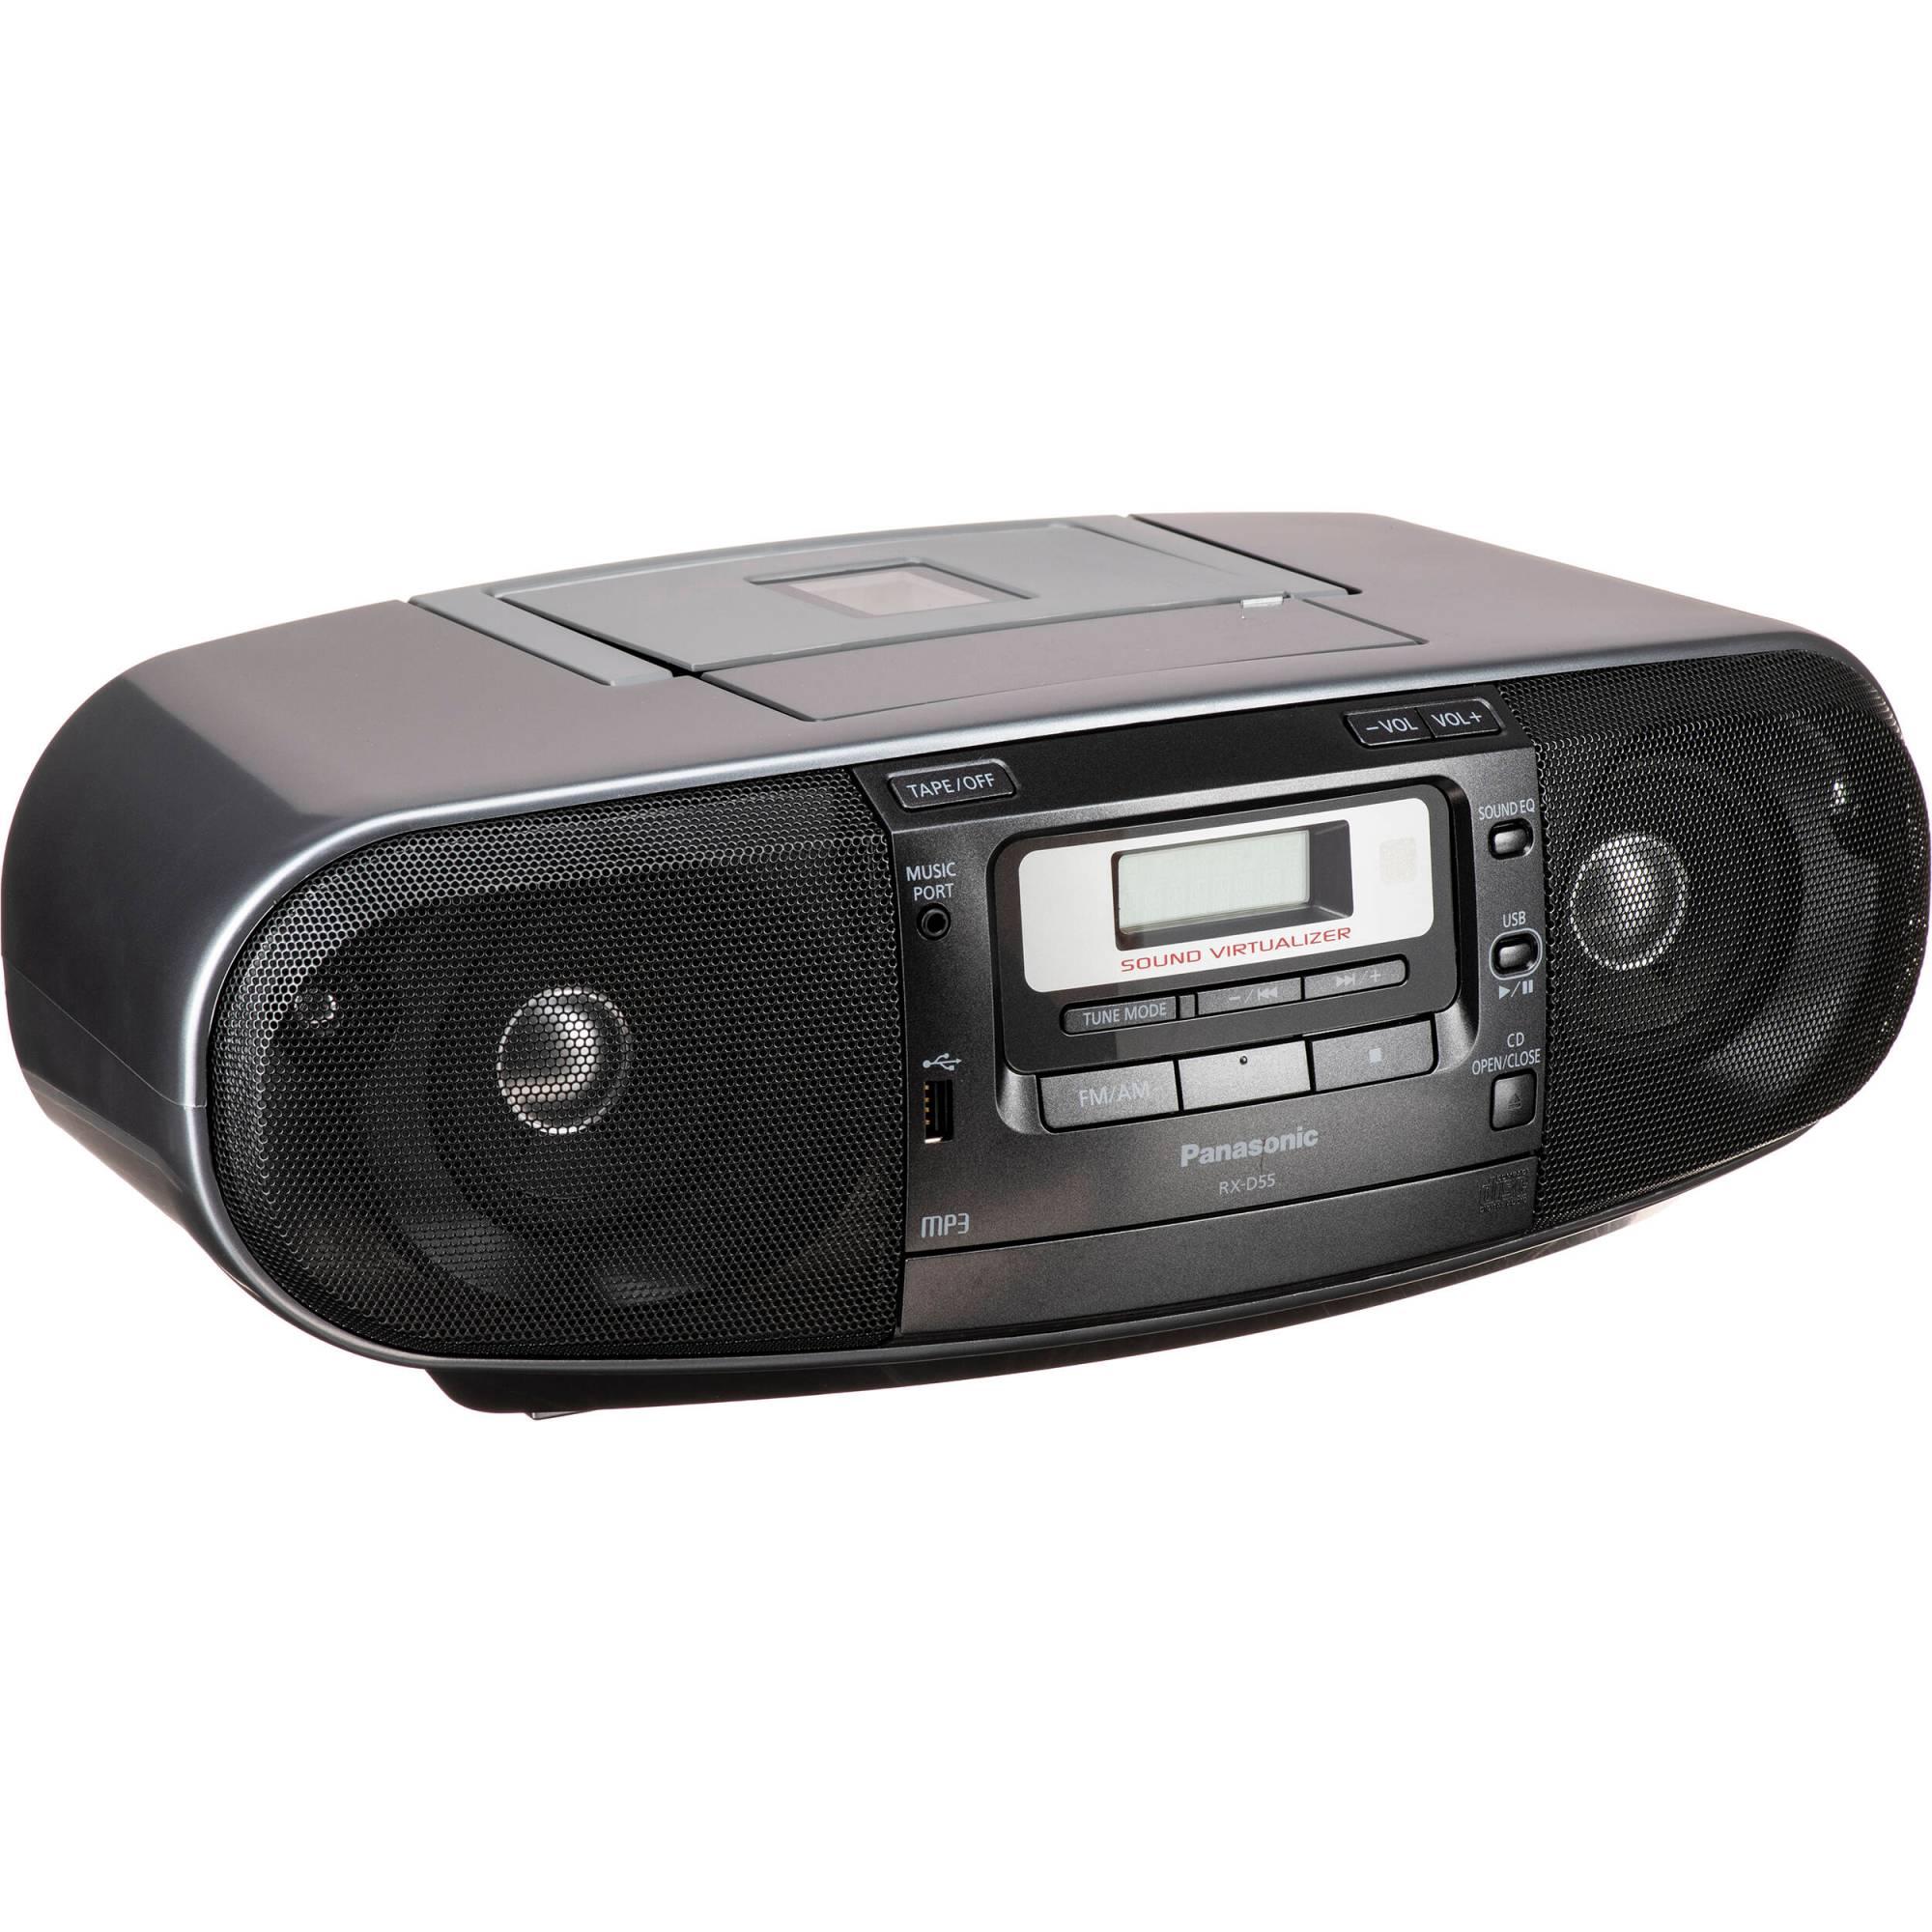 hight resolution of panasonic rx d55 cd radio cassette recorder